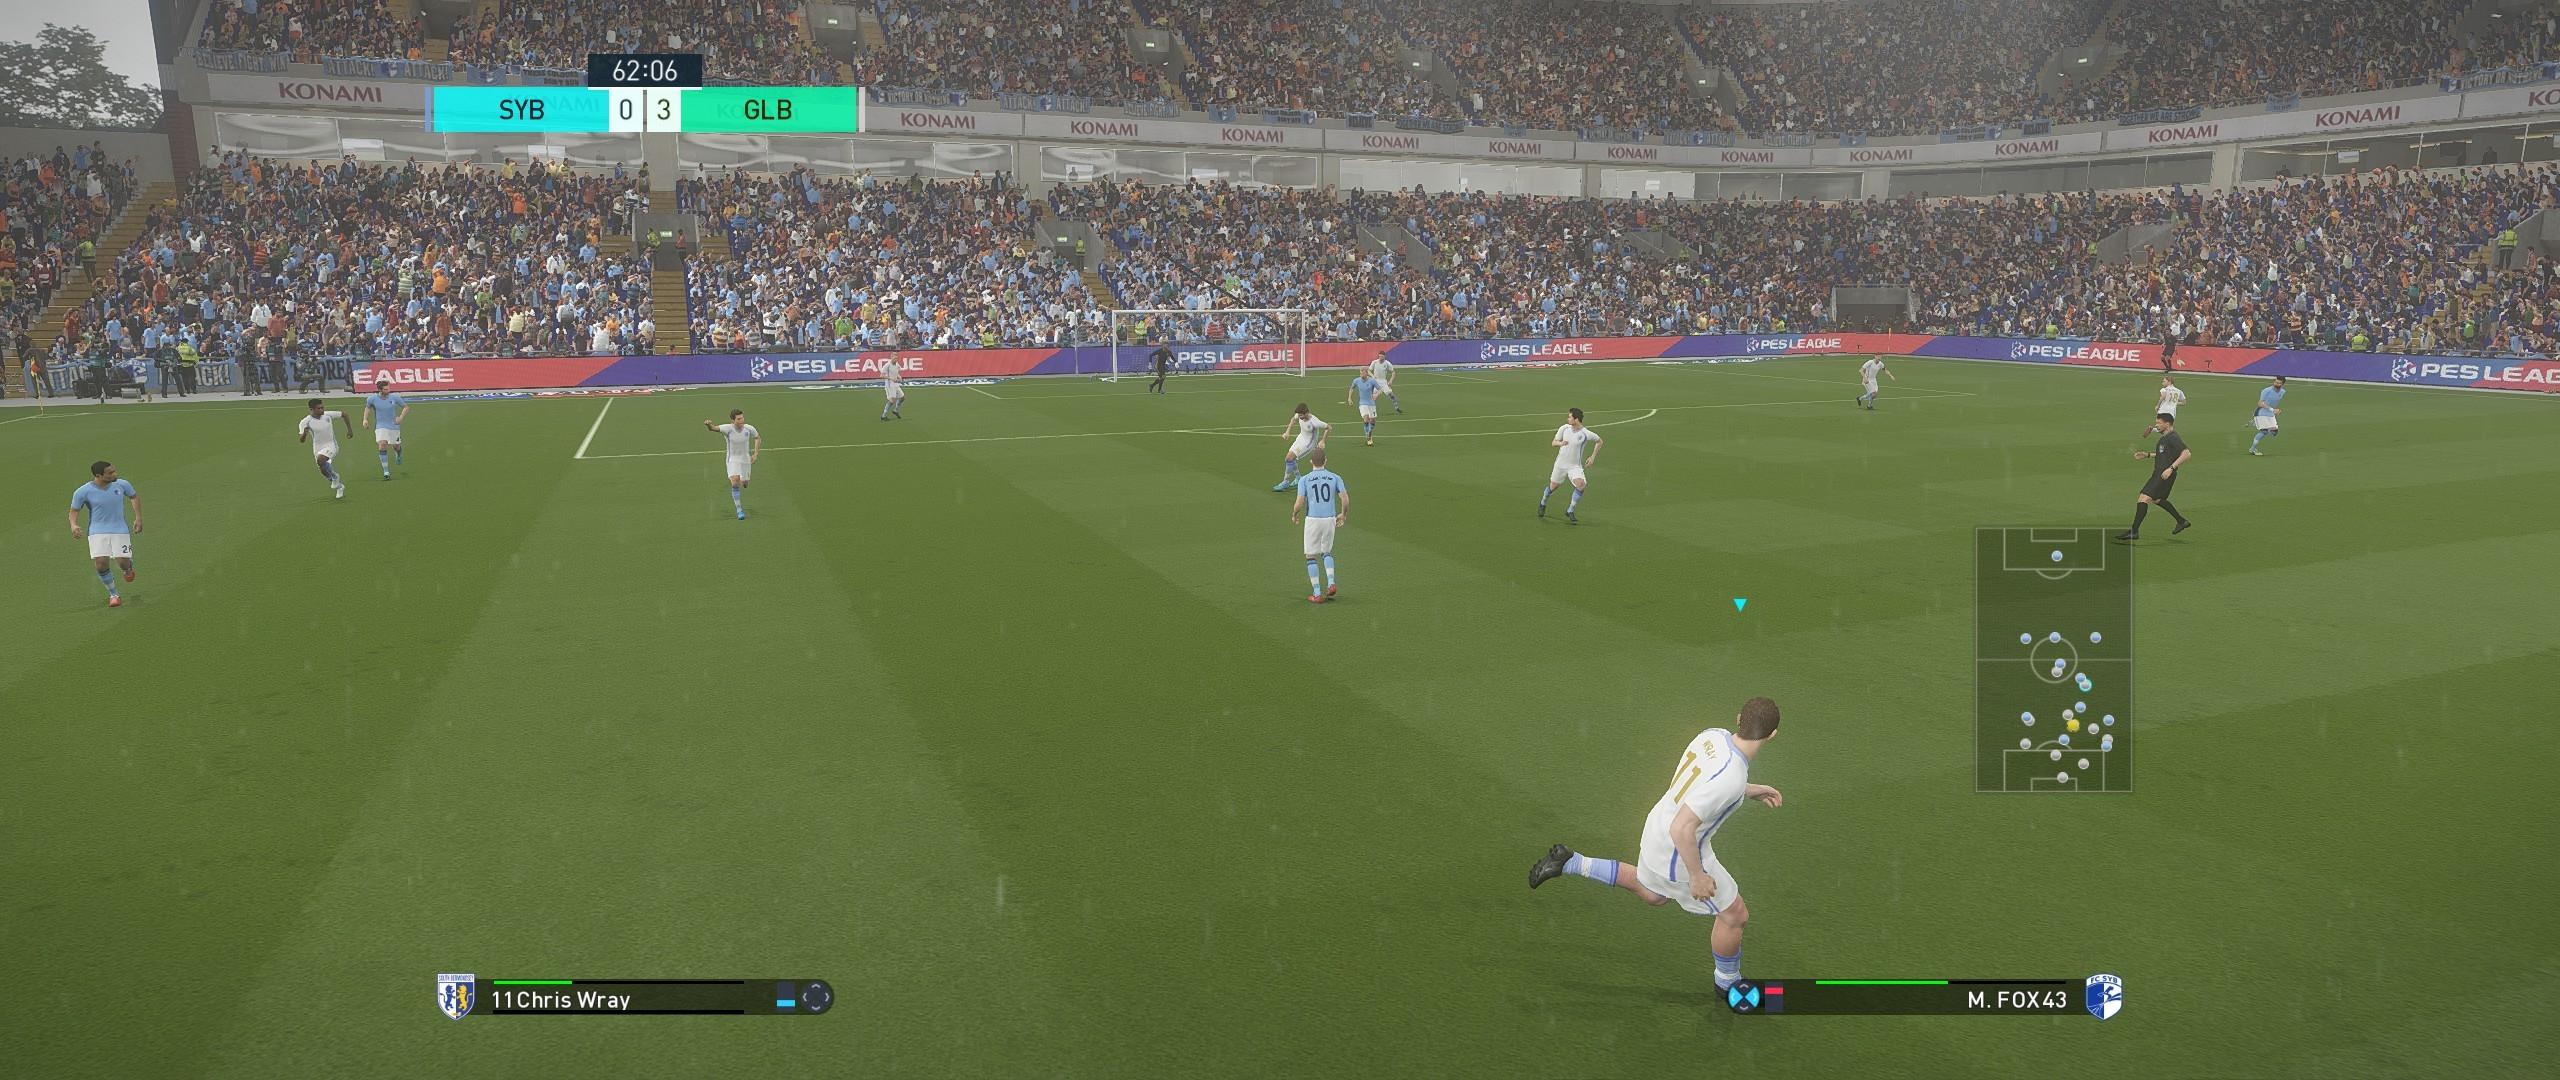 Pro Evolution Soccer 2018 Review - Become a Legend